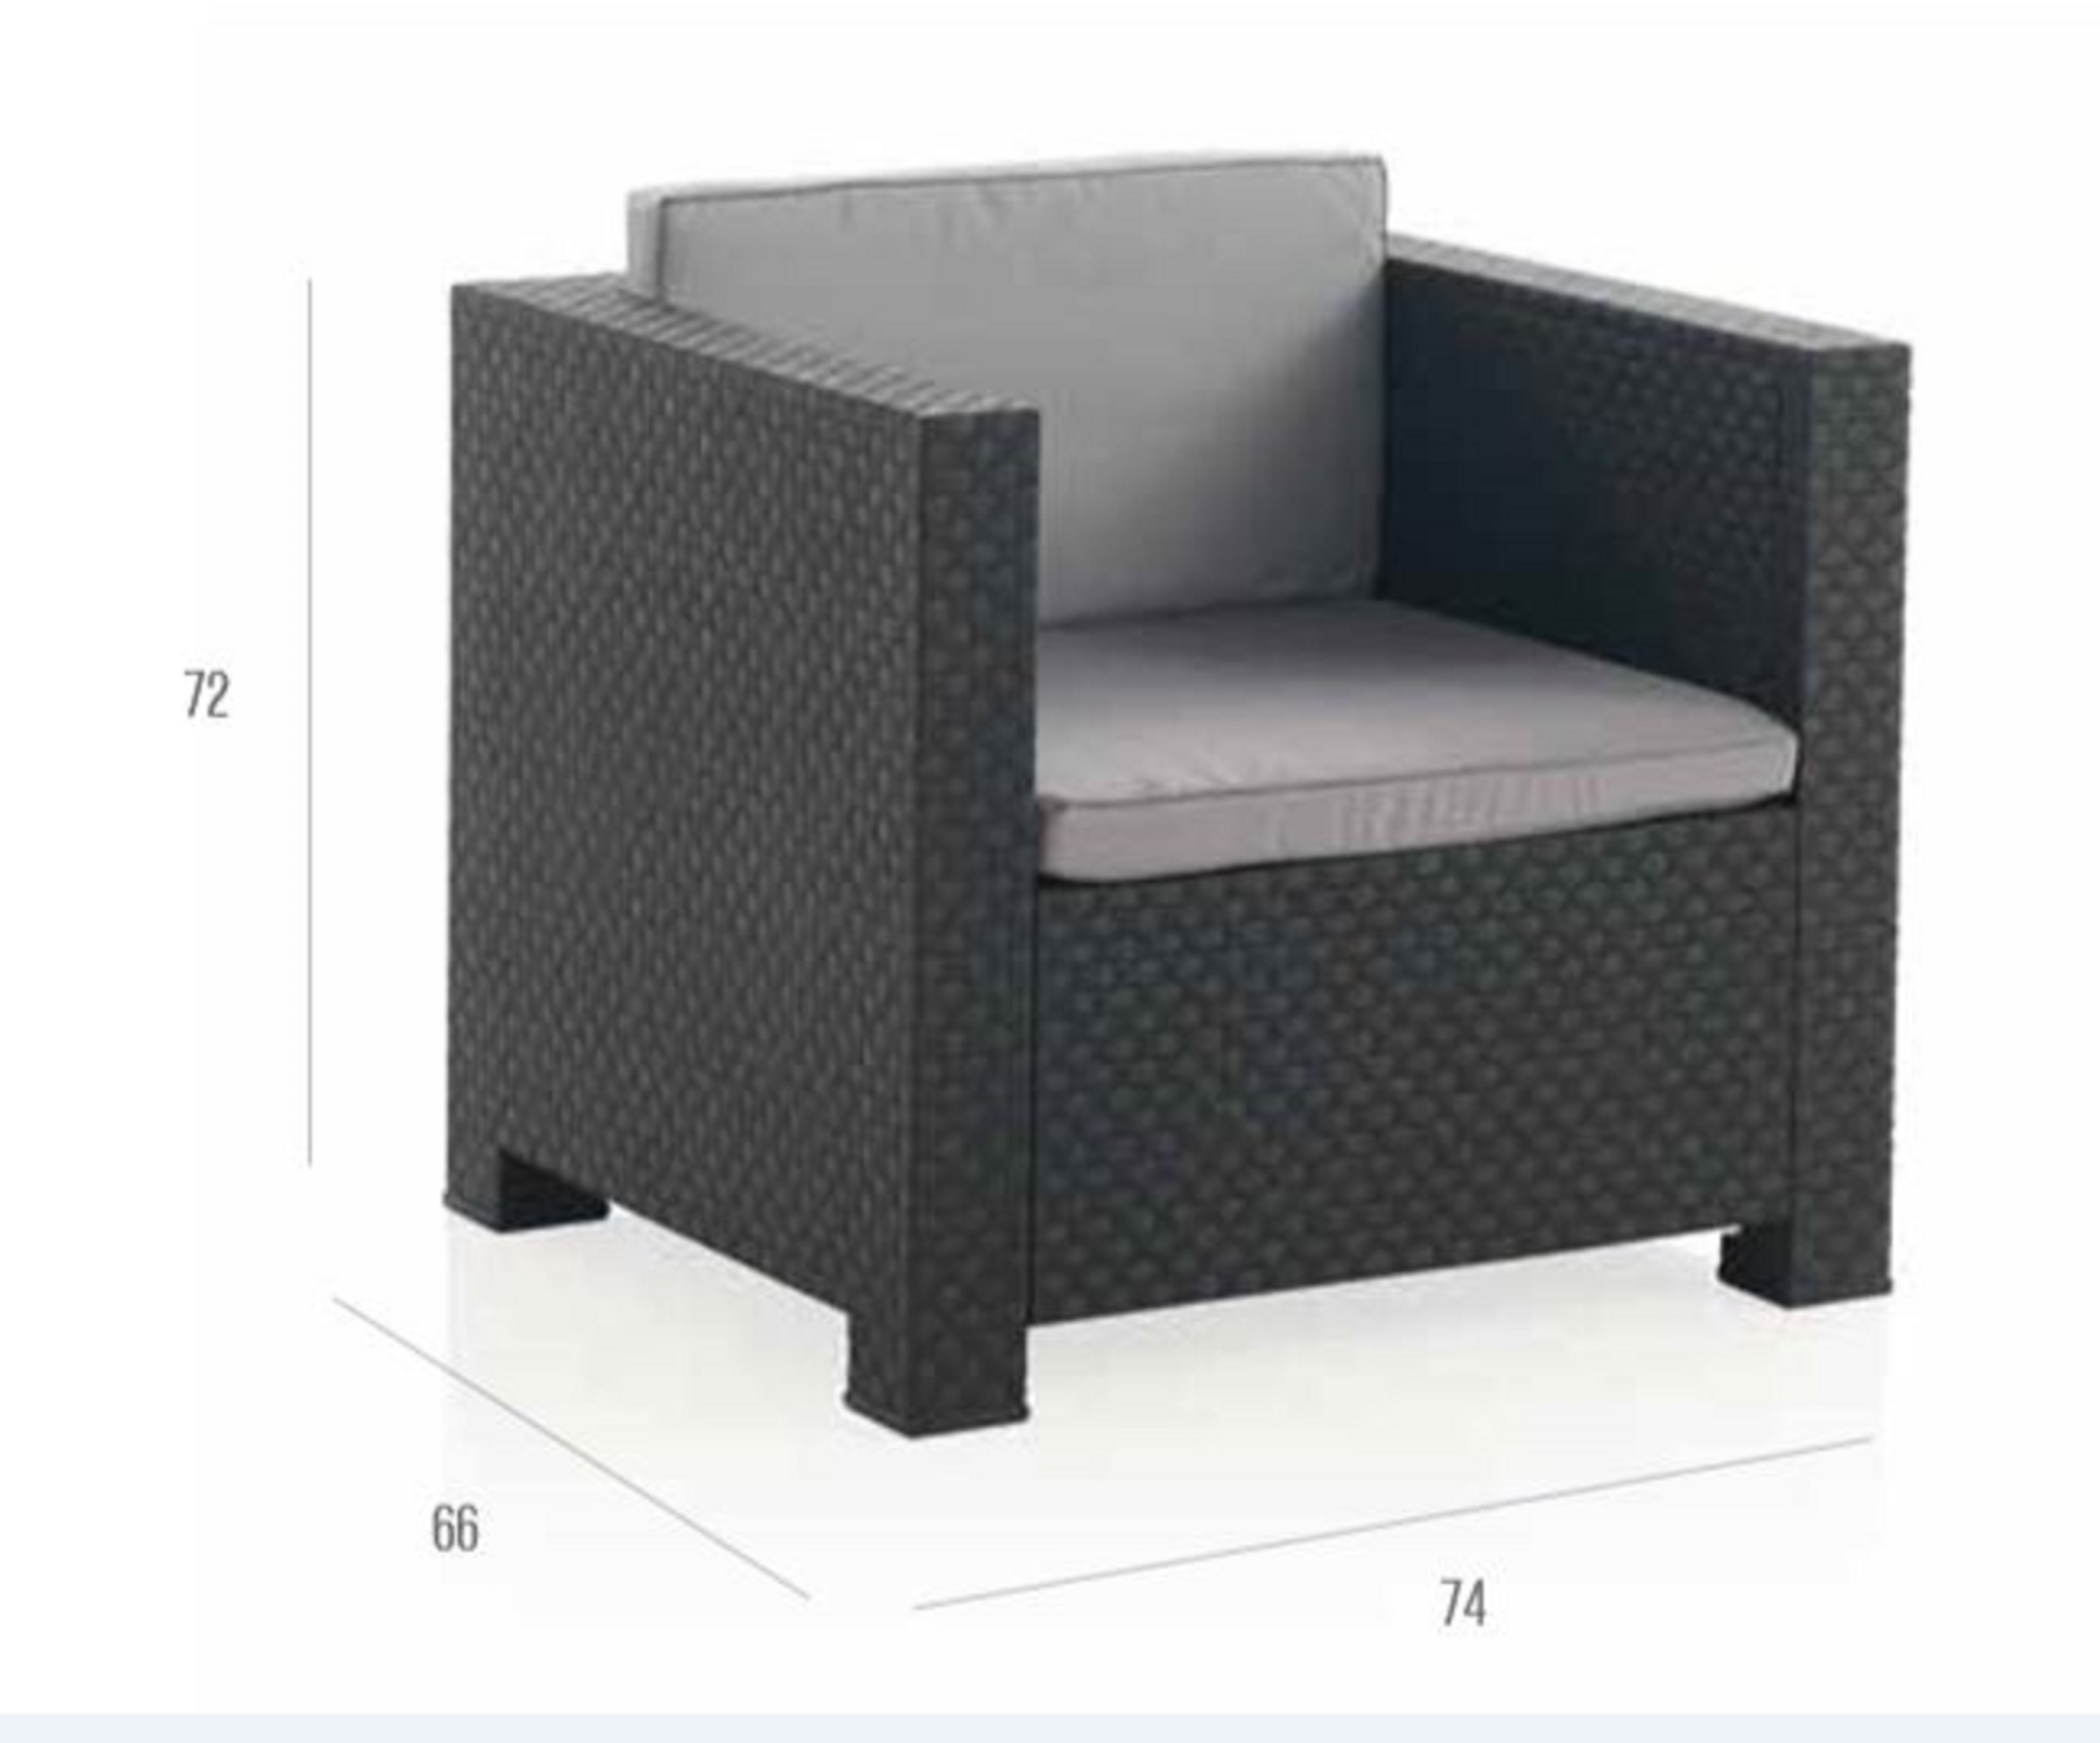 Tete A Tete Gartenmobel Balkon Lounge Rattan Optik Anthrazit